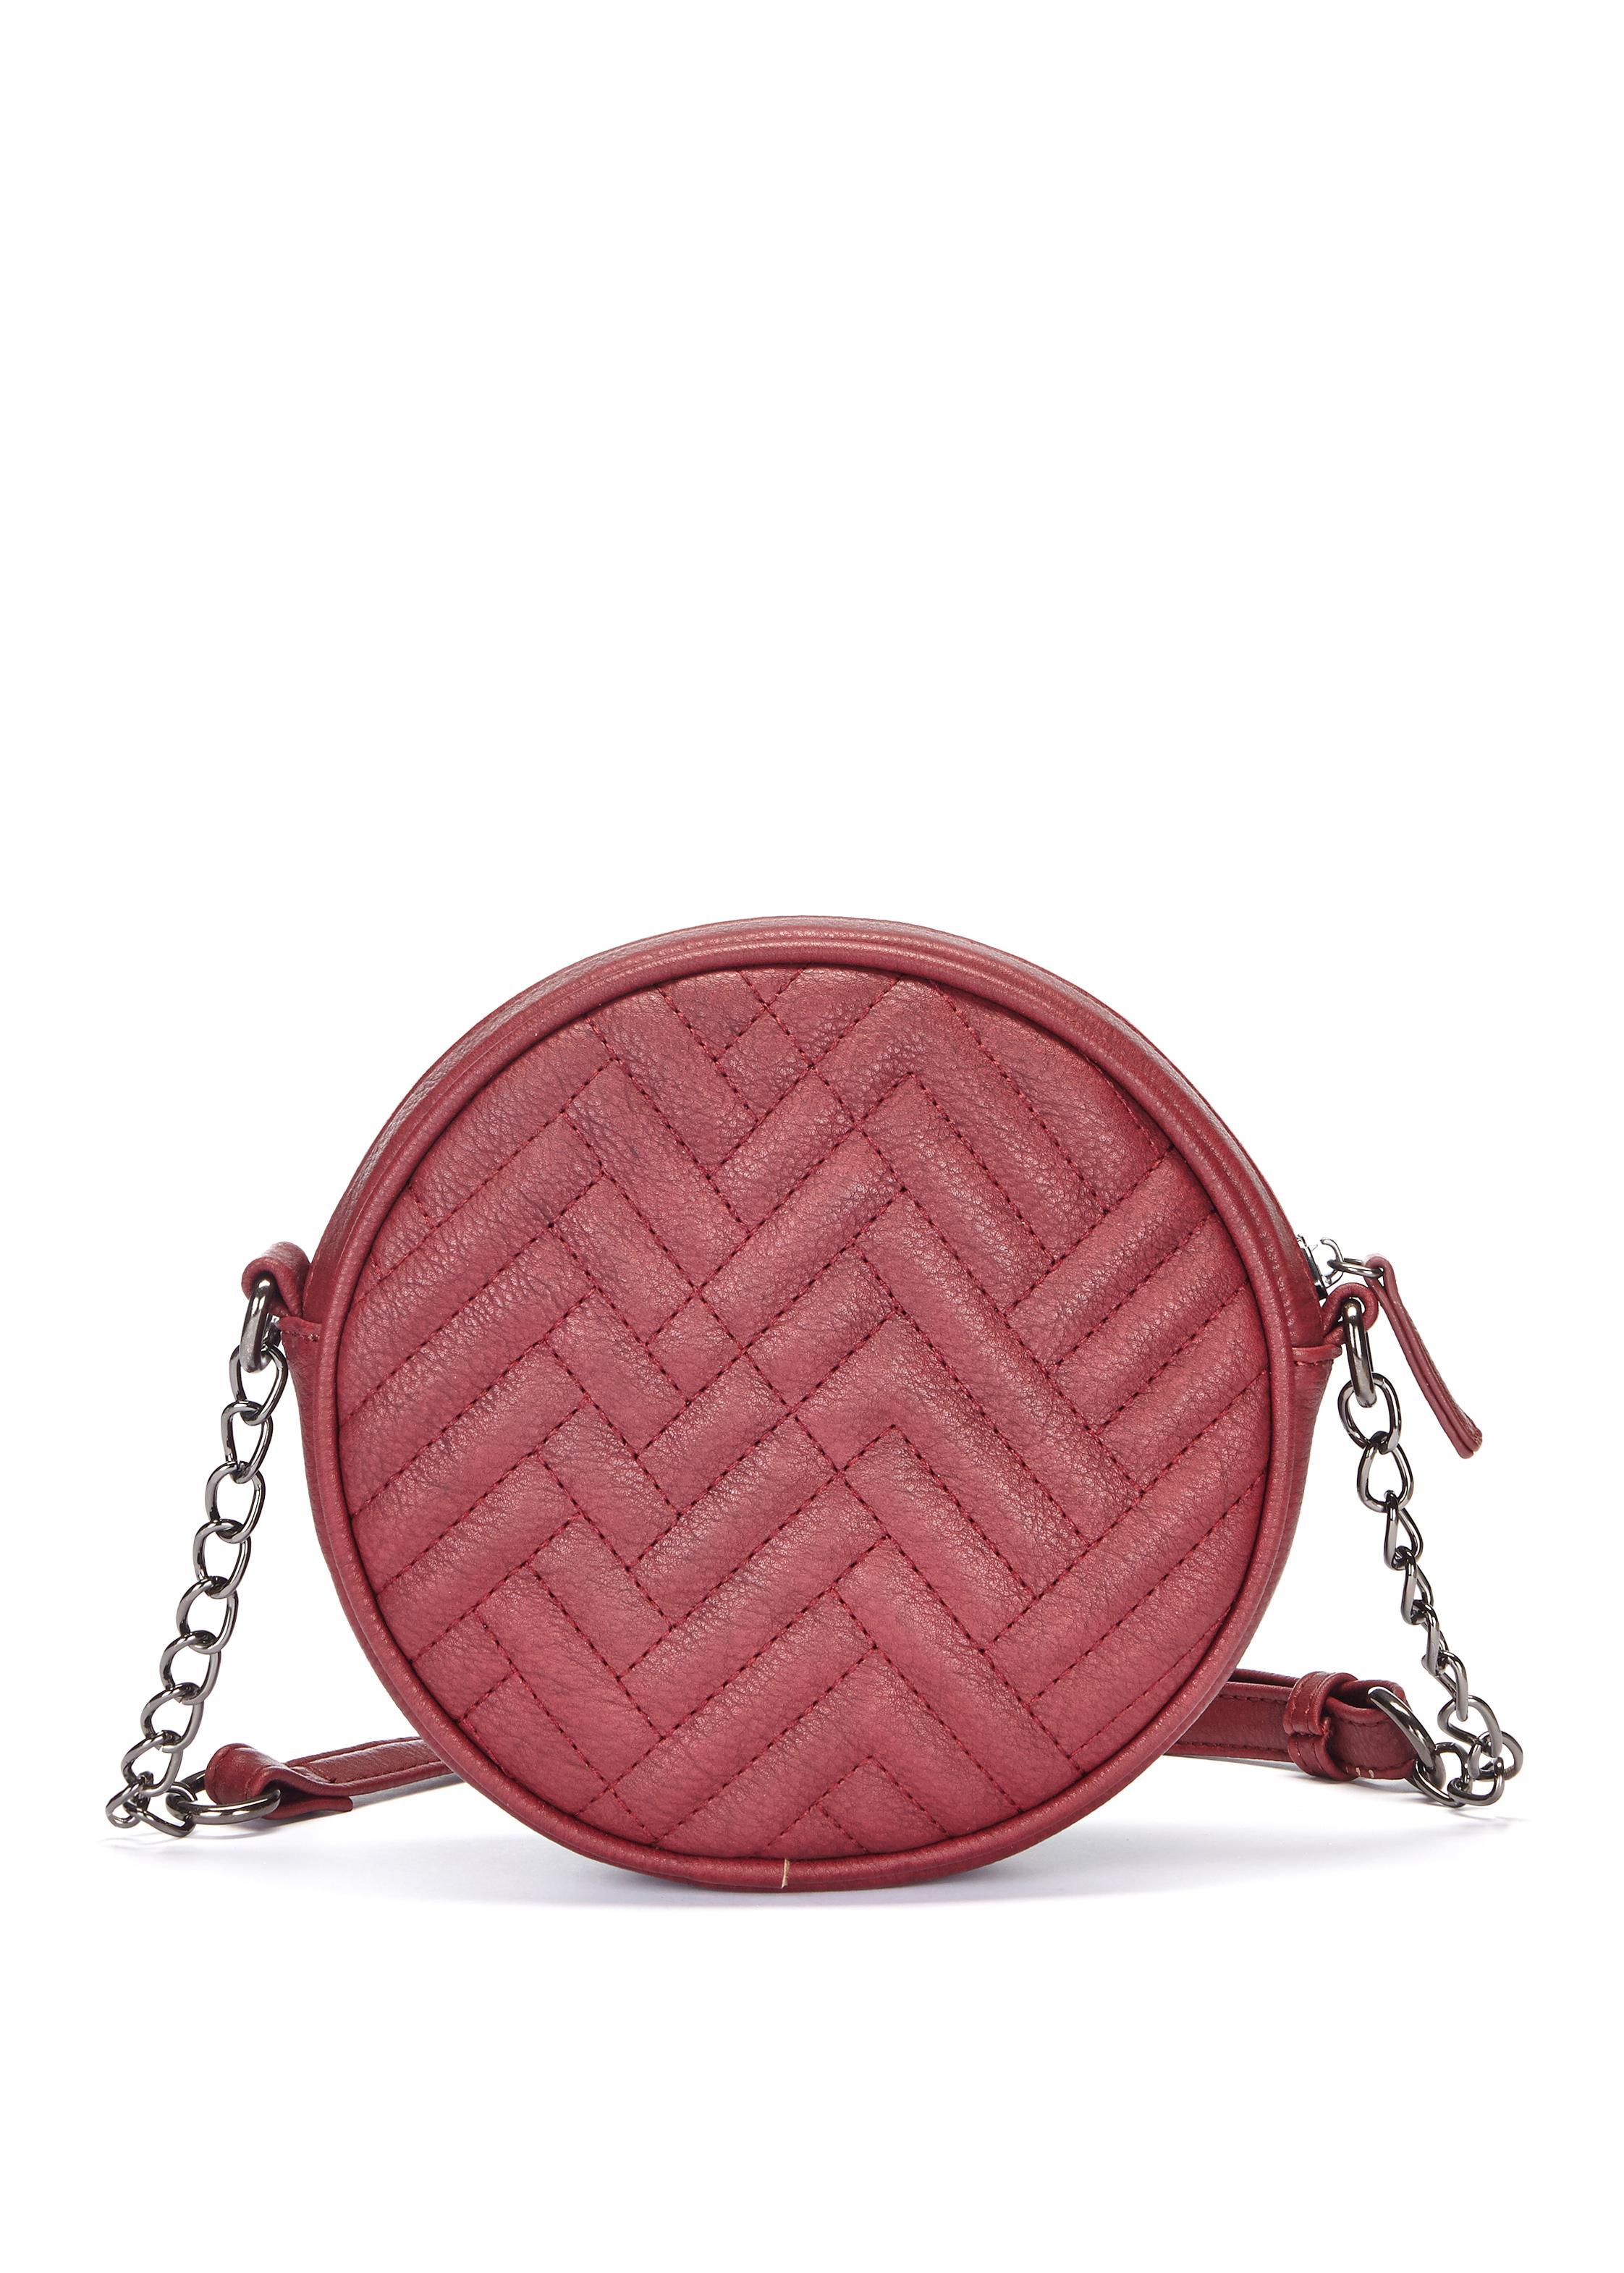 LASCANA Mini Bag | Taschen > Handtaschen > Abendtaschen | Rot | Lascana